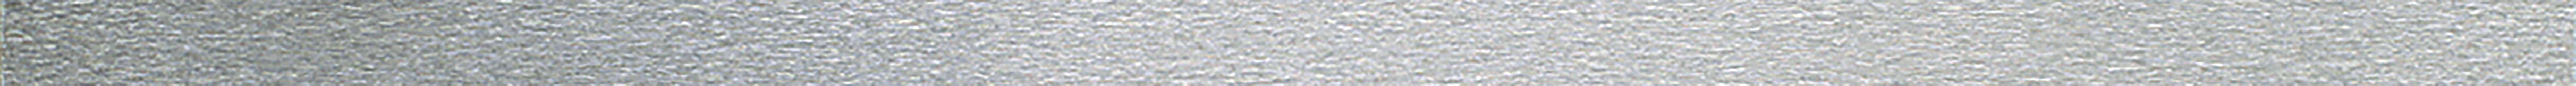 Finestra 1B